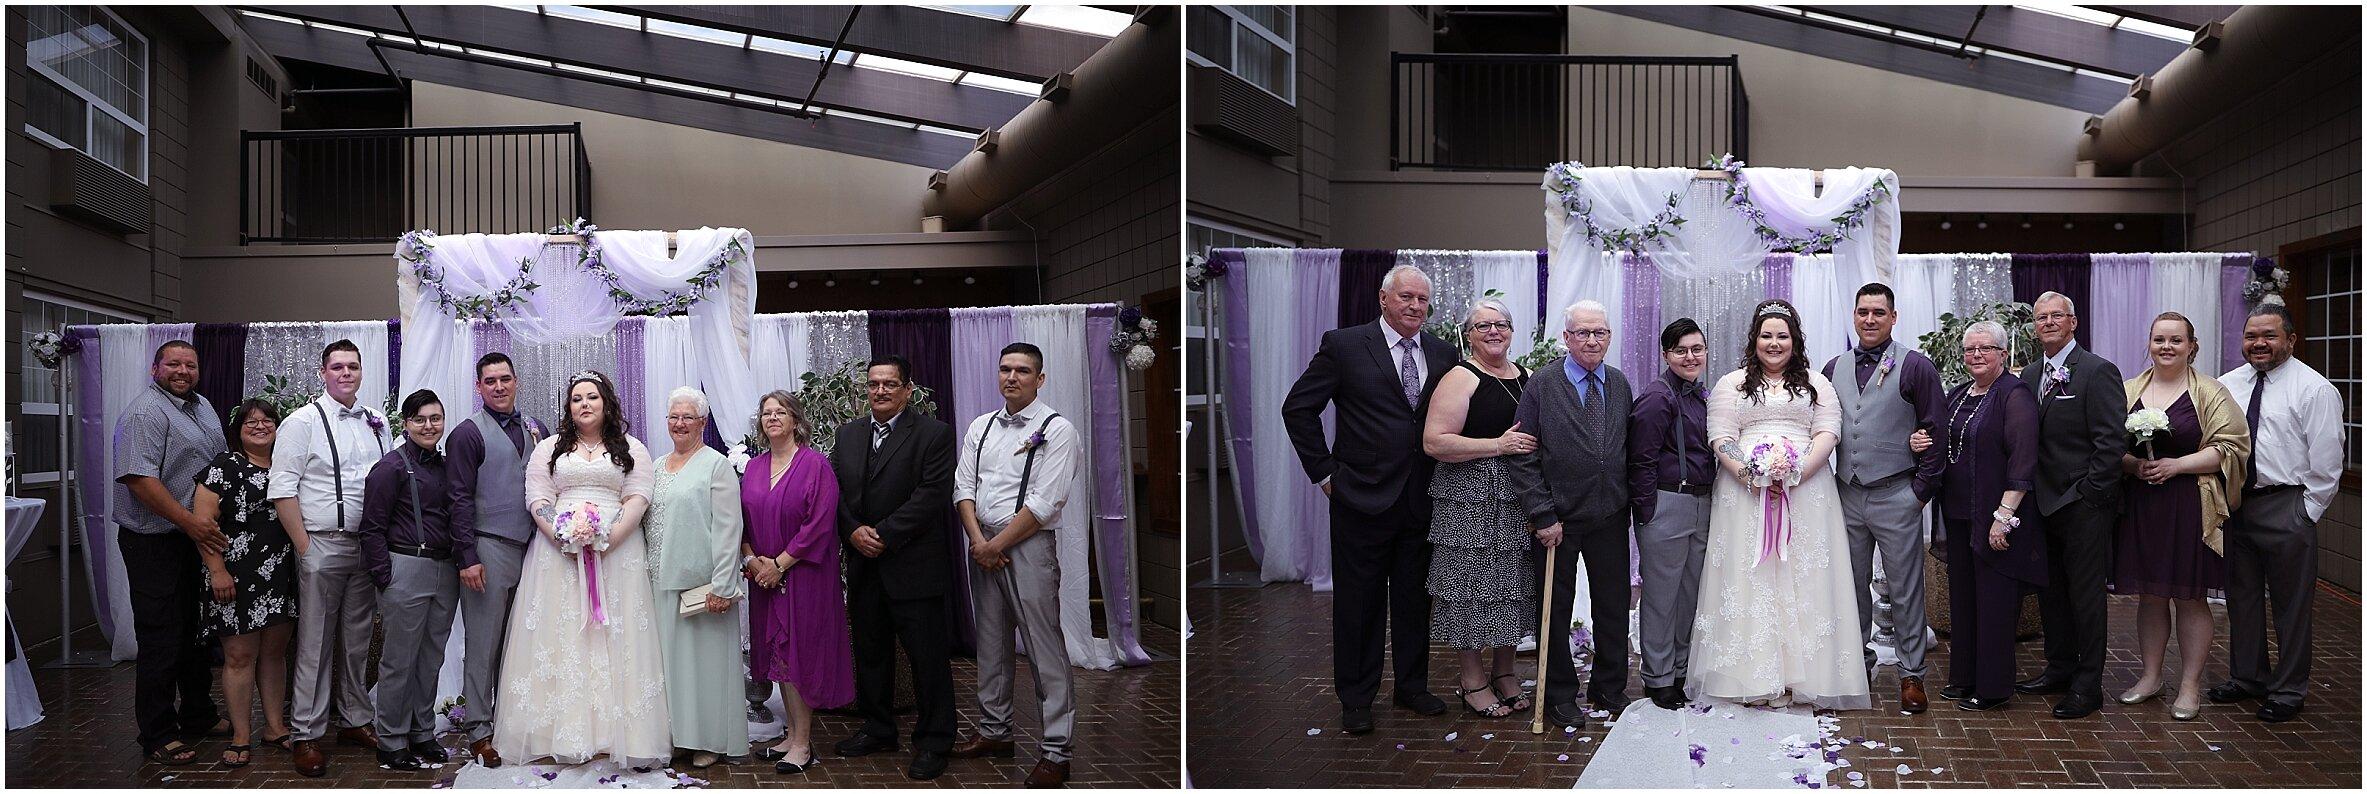 vancouver-wedding-photographer-the-loft-earls-yaletown_0146.jpg